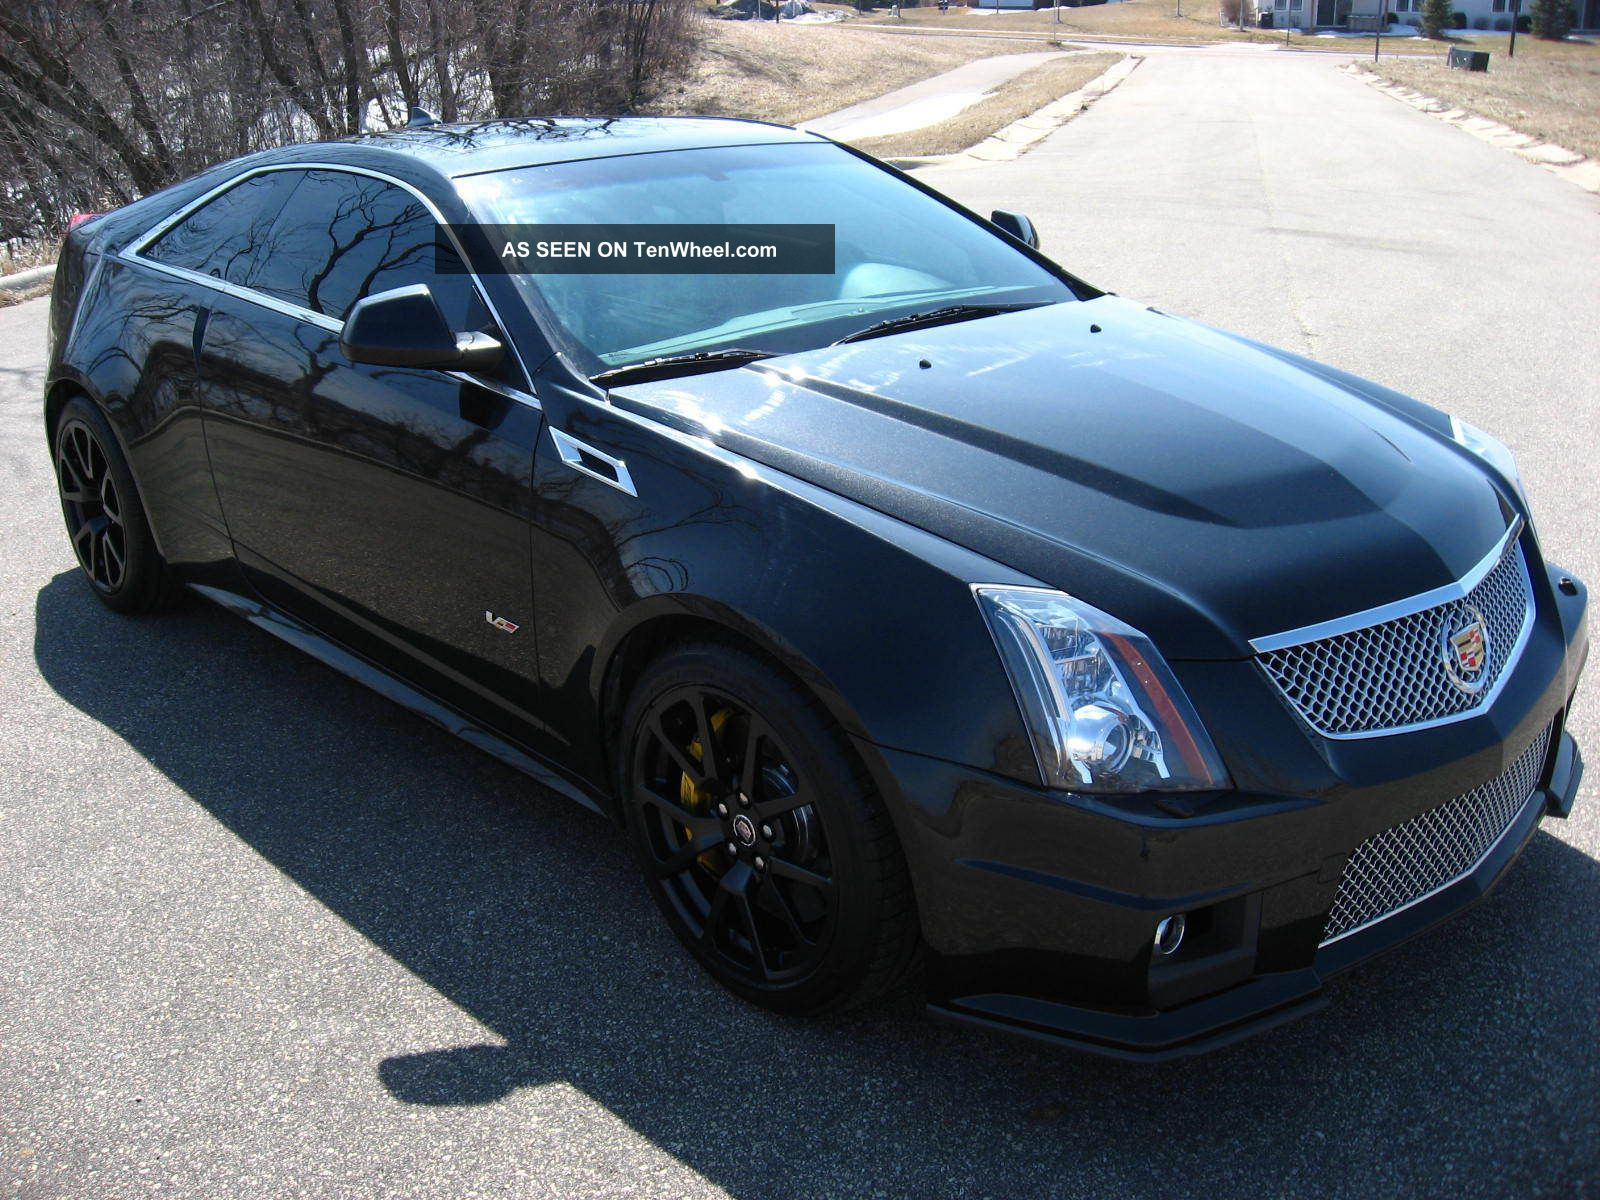 2011 cadillac cts v ctsv coupe black diamond 556hp 6 2 v8 auto black. Black Bedroom Furniture Sets. Home Design Ideas